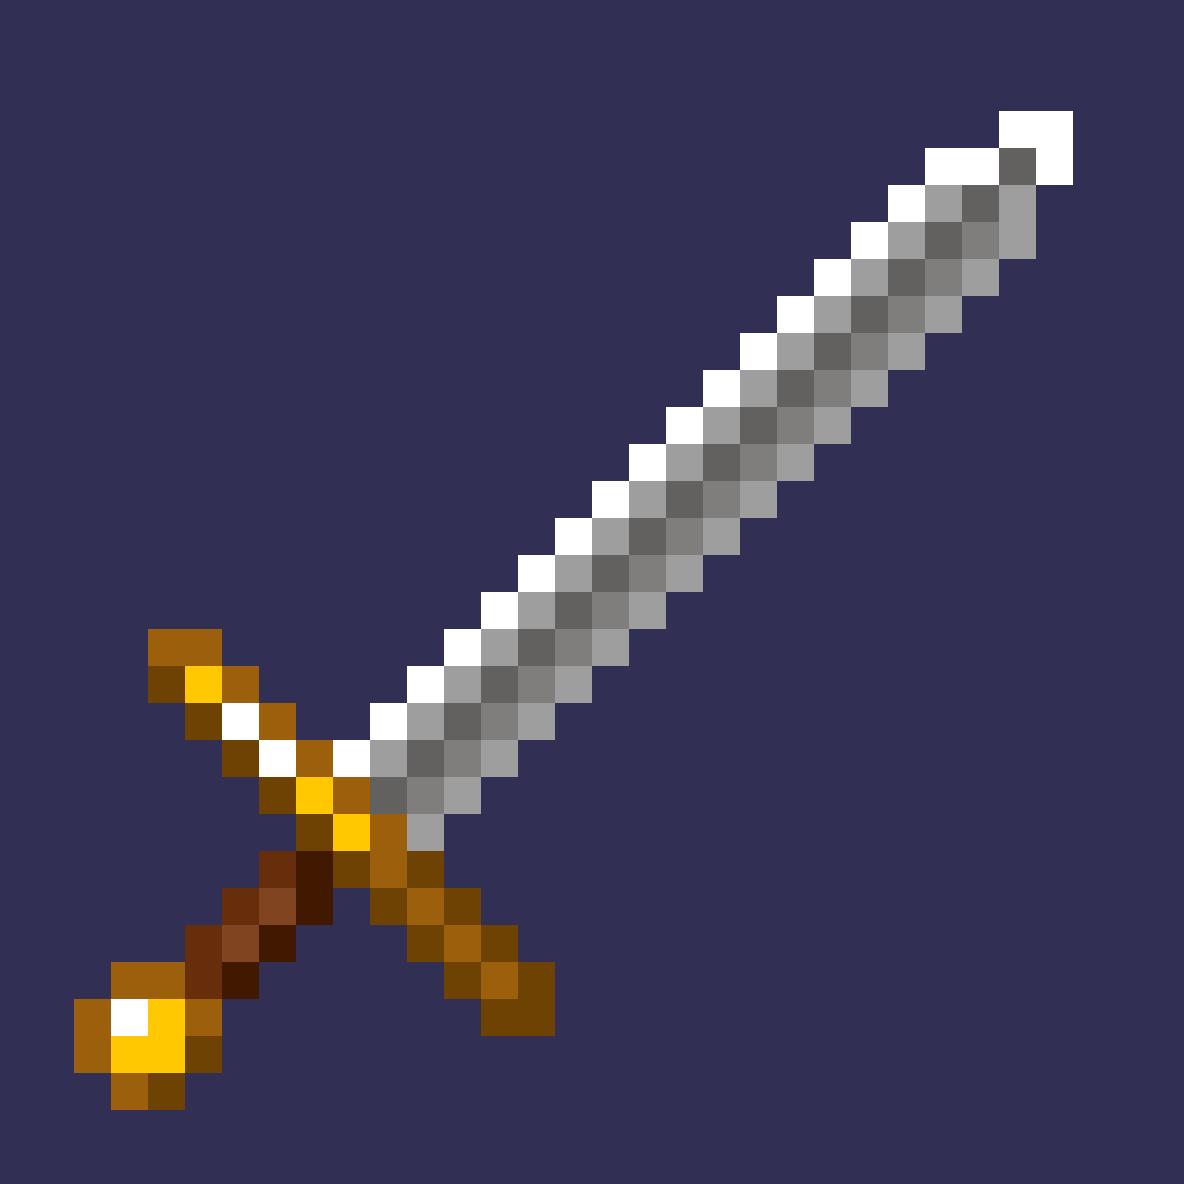 текстуры для майнкрафт на меч #4